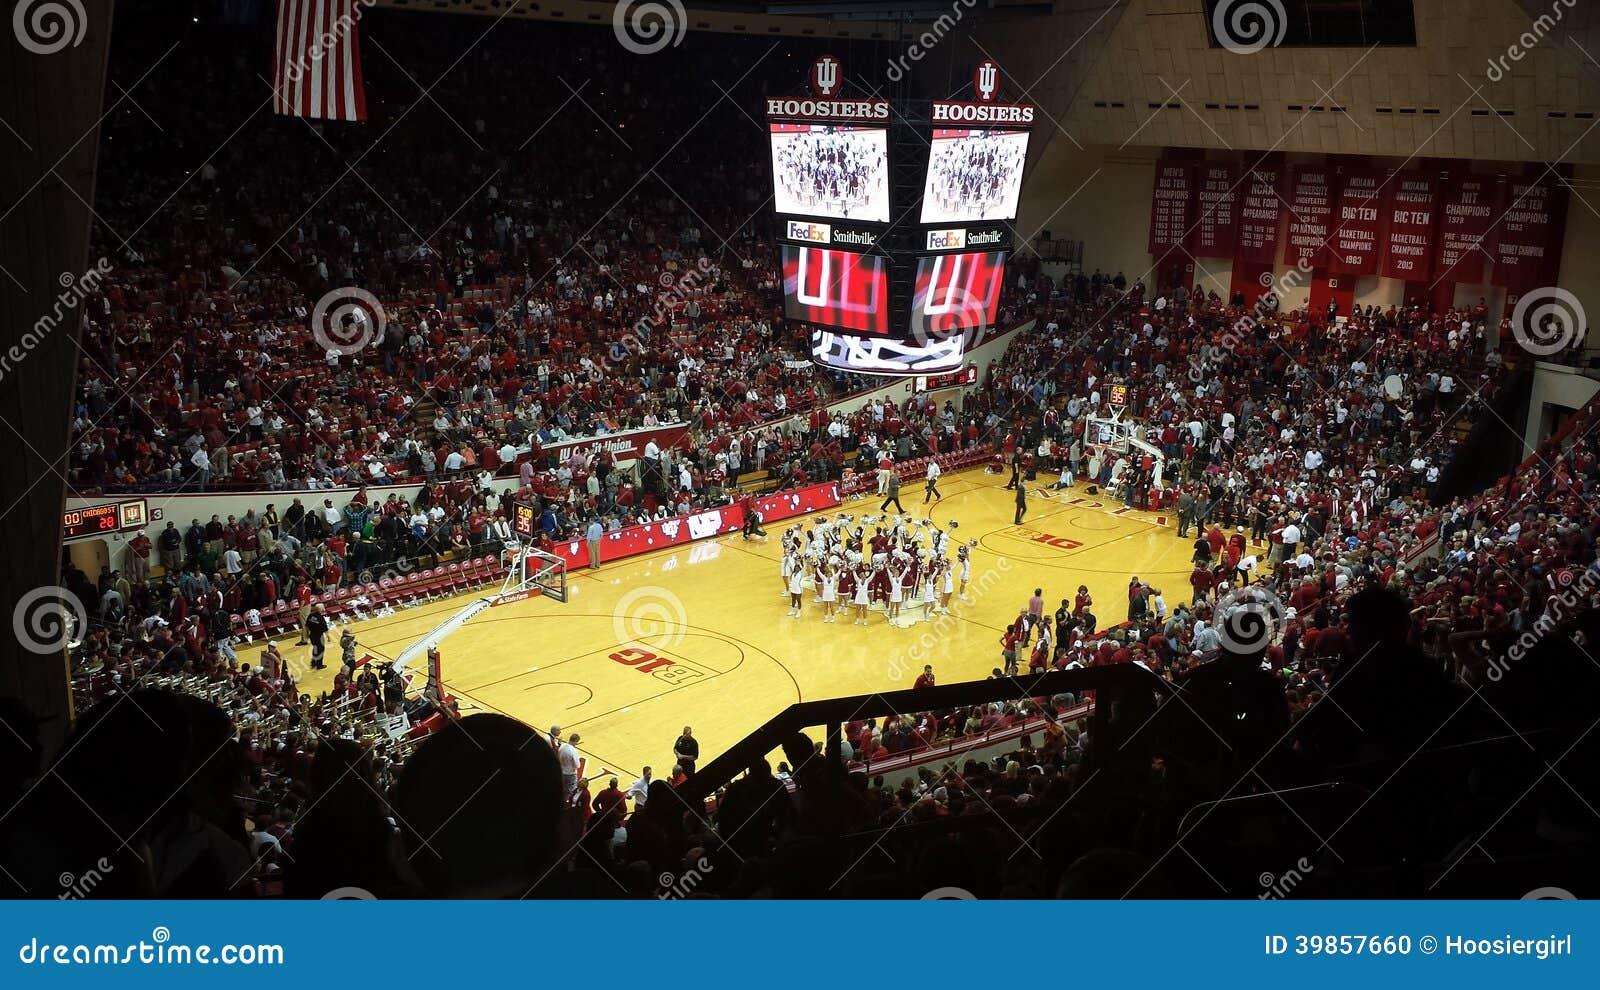 Assembly Hall basketball stadium at Indiana University